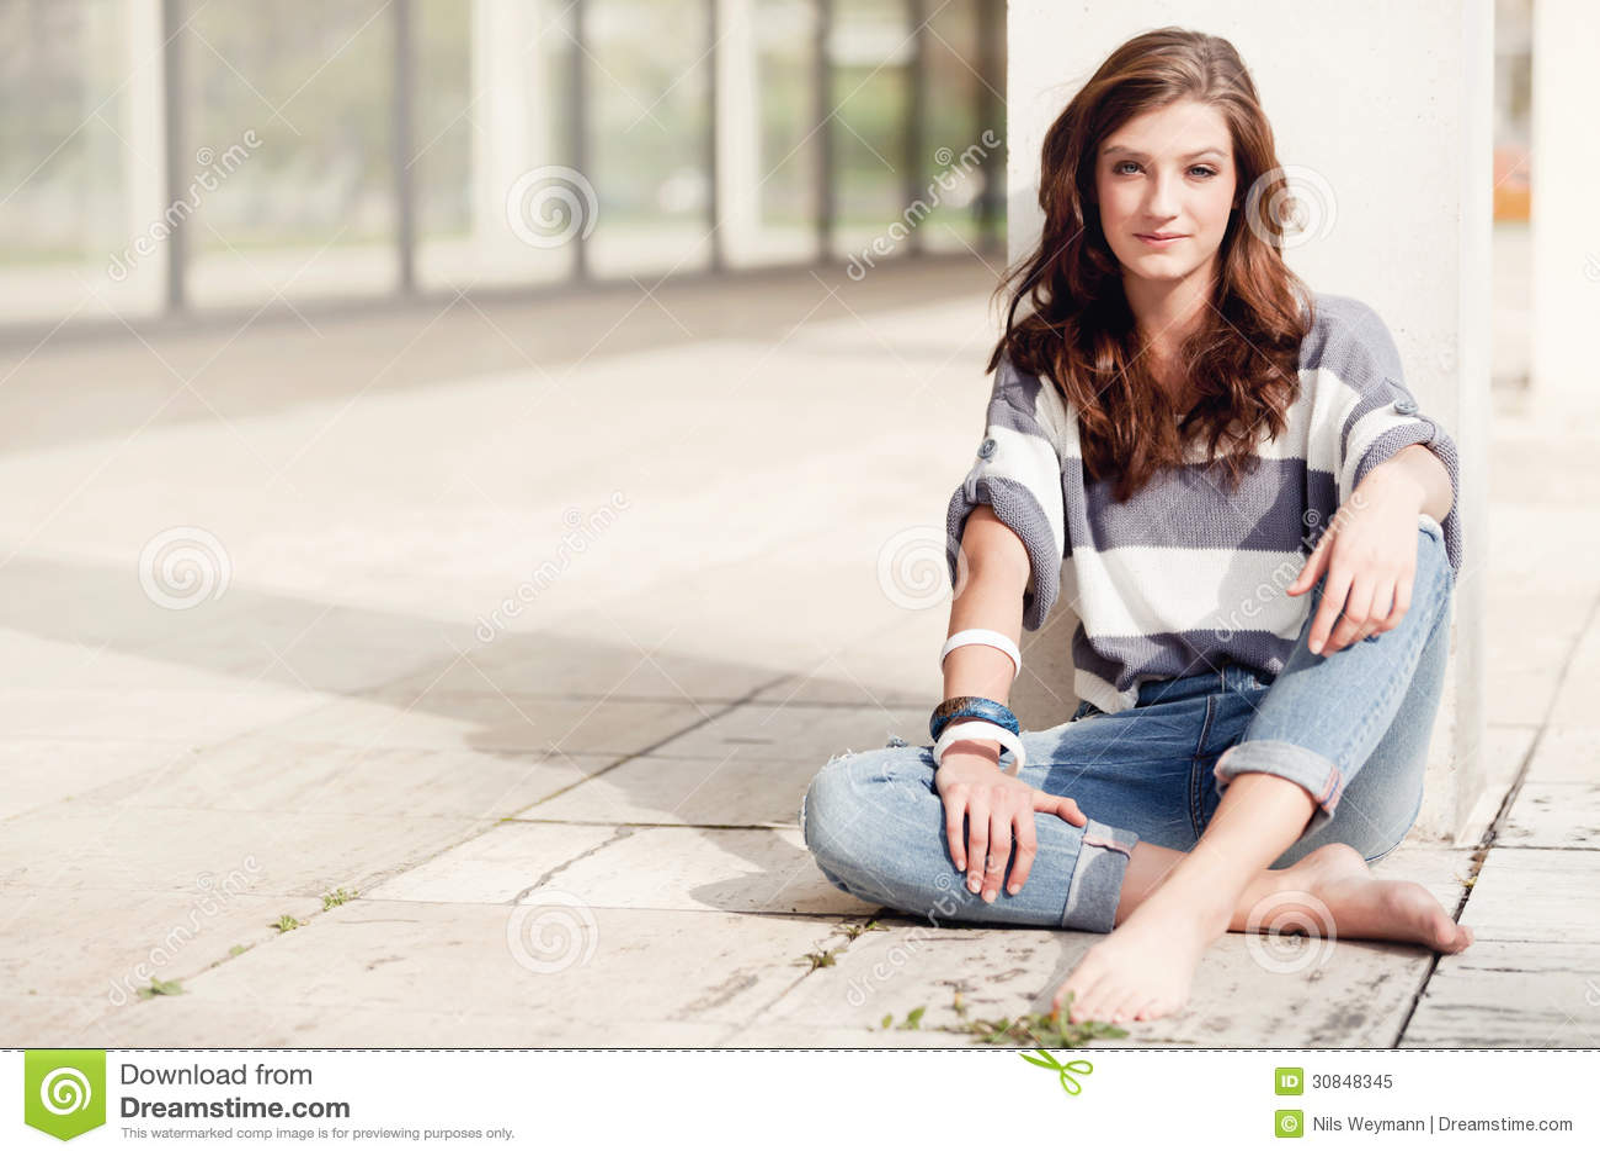 https://thumbs.dreamstime.com/z/attractive-woman-barefoot-summertime-outdoor-young-brunette-30848345.jpg